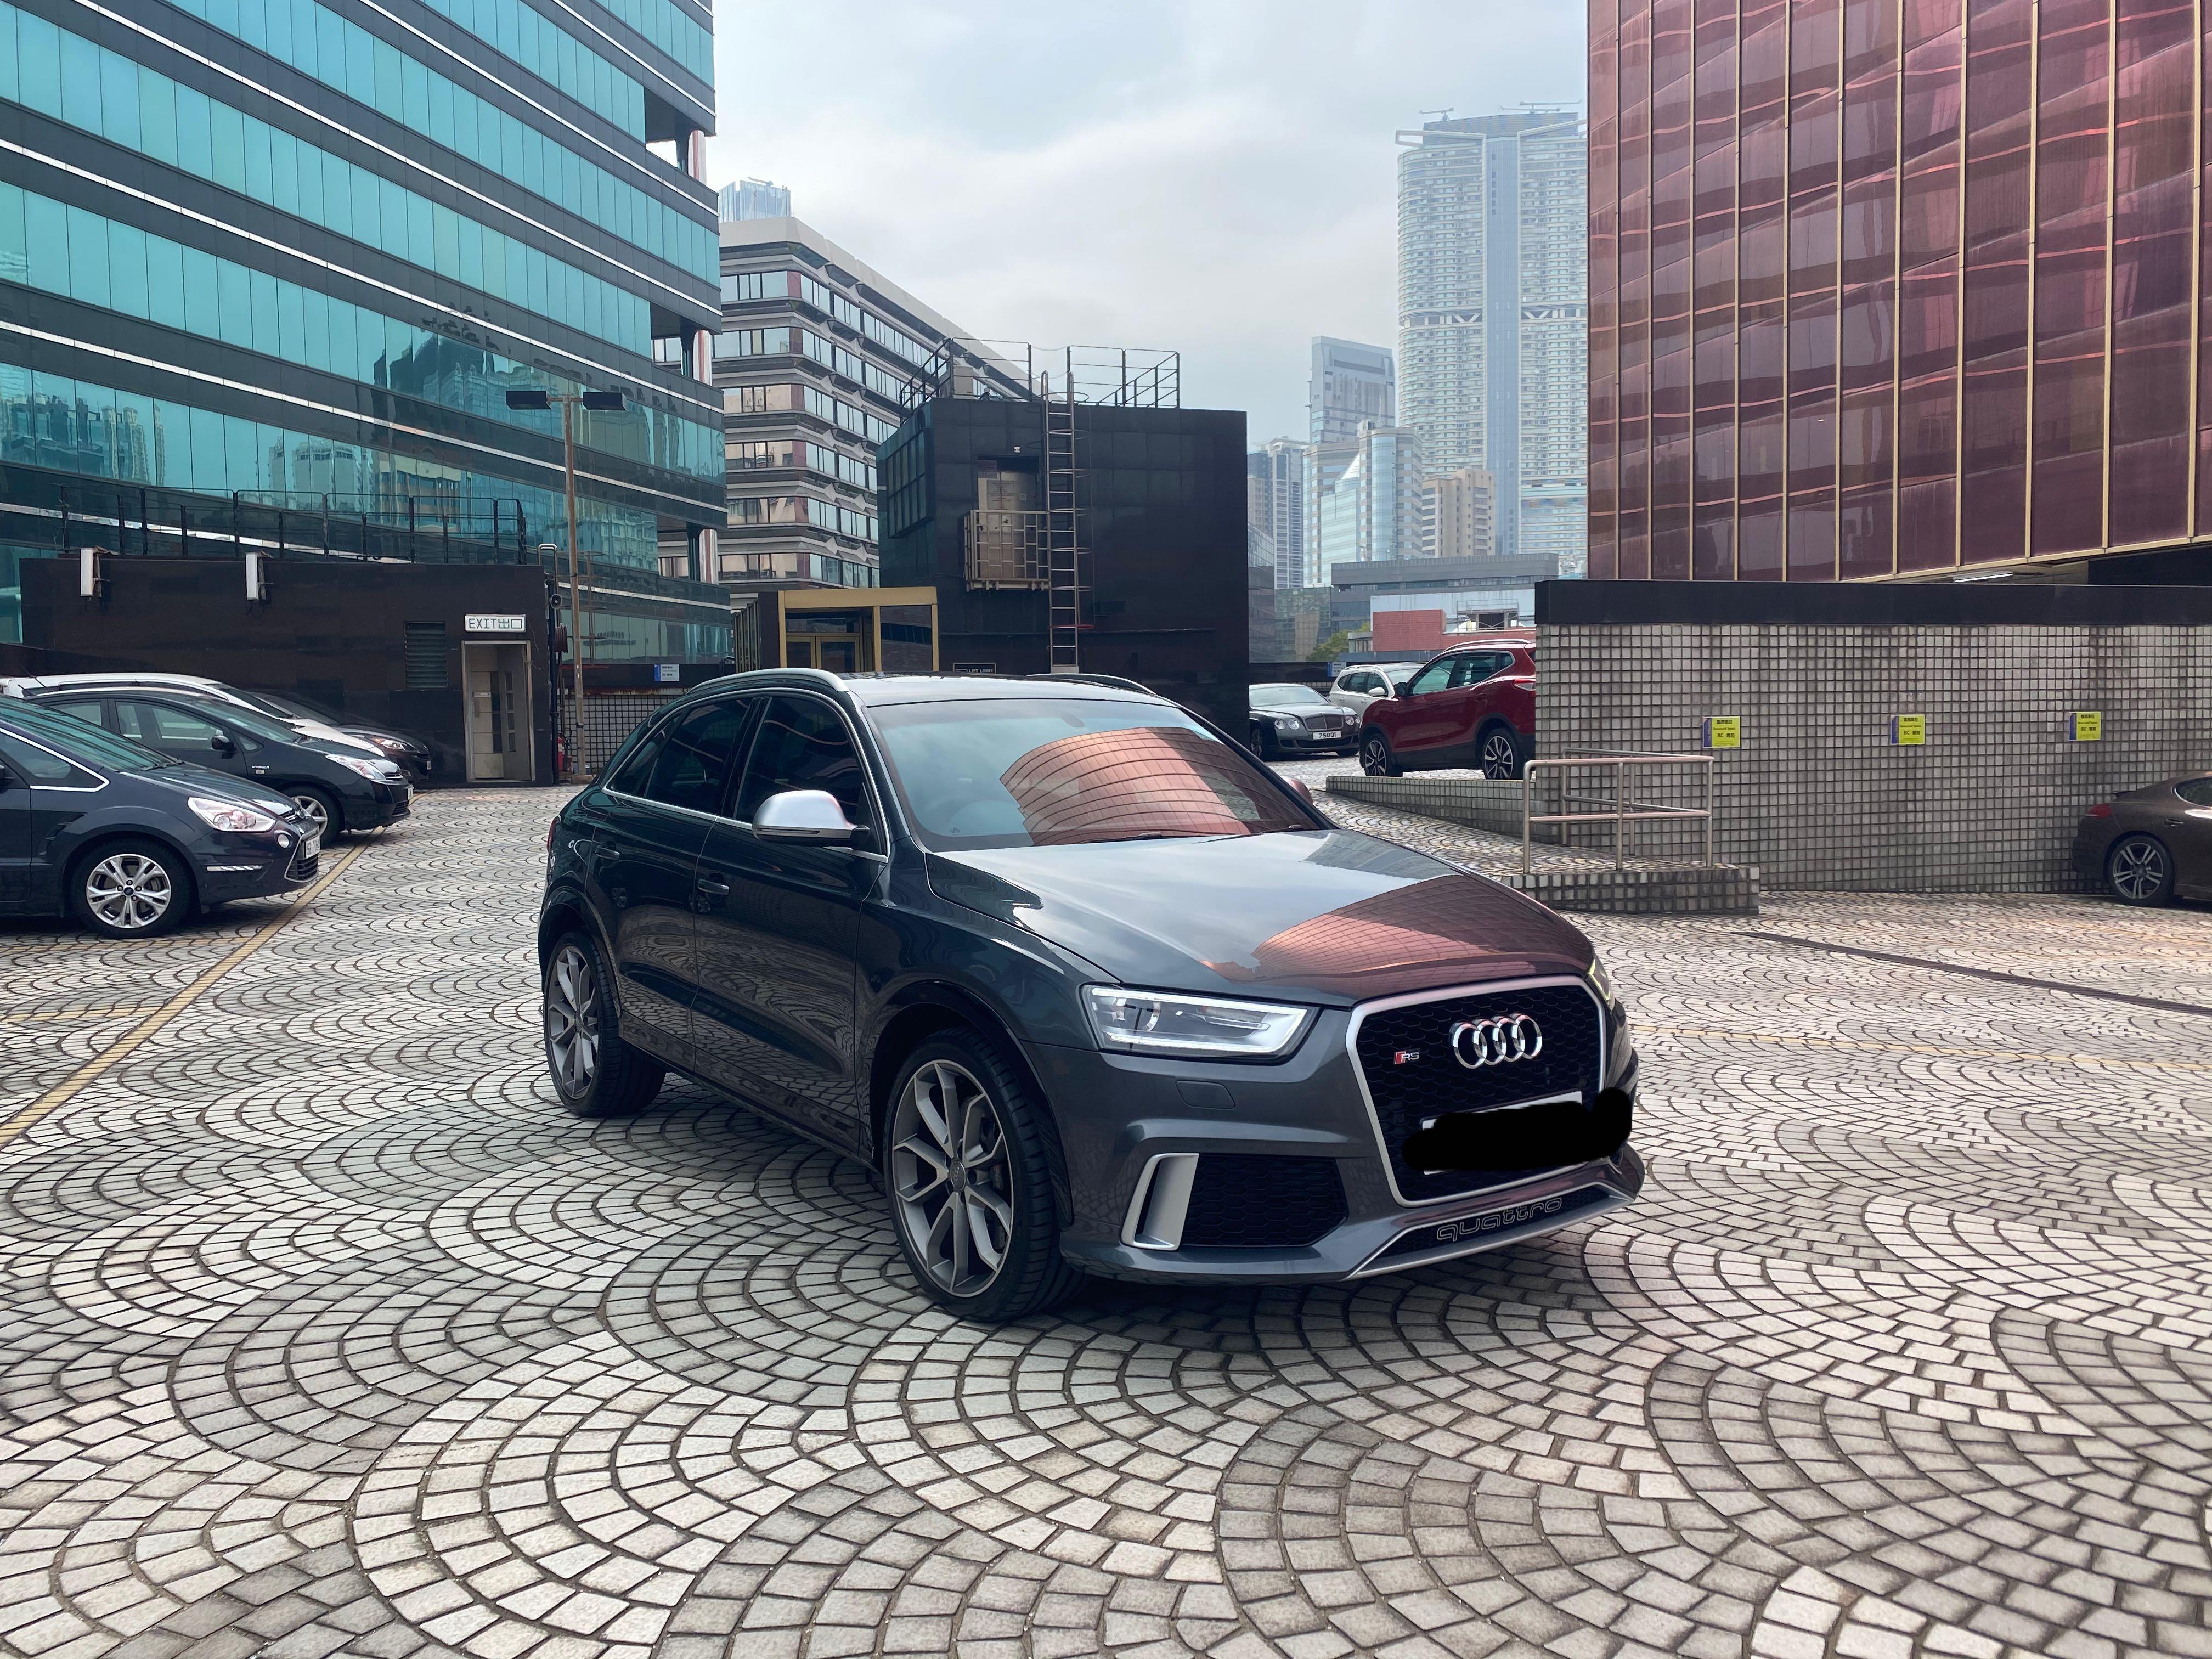 Audi RSQ3 2.5 QUATTRO Auto